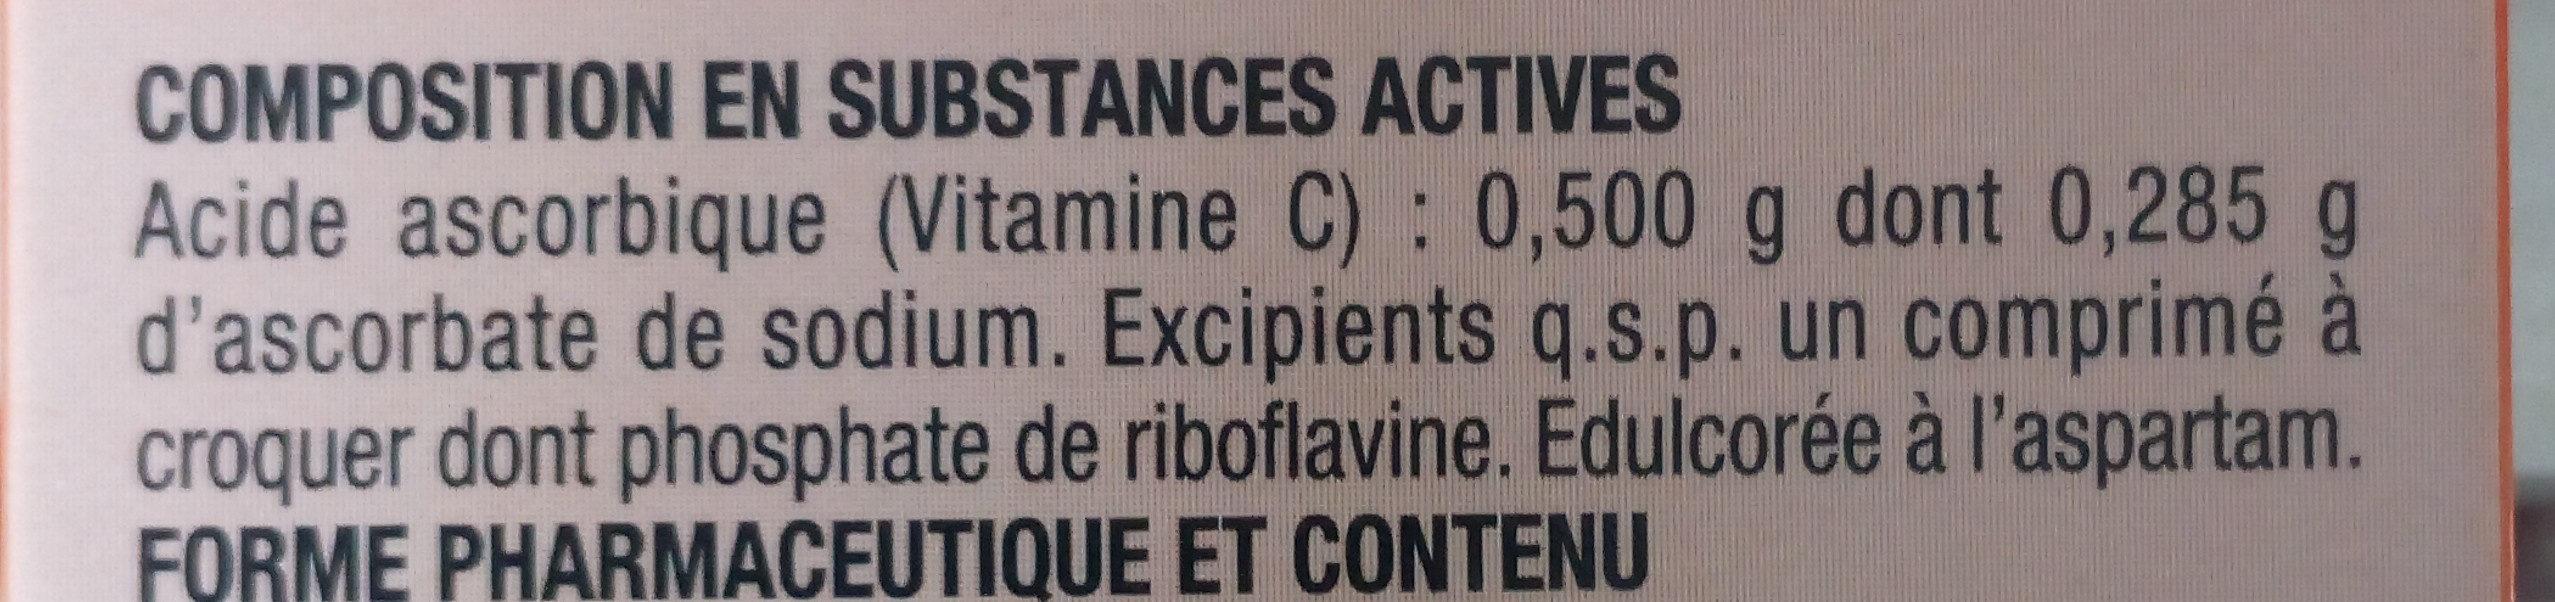 Vitamine C UPSA - Ingrédients